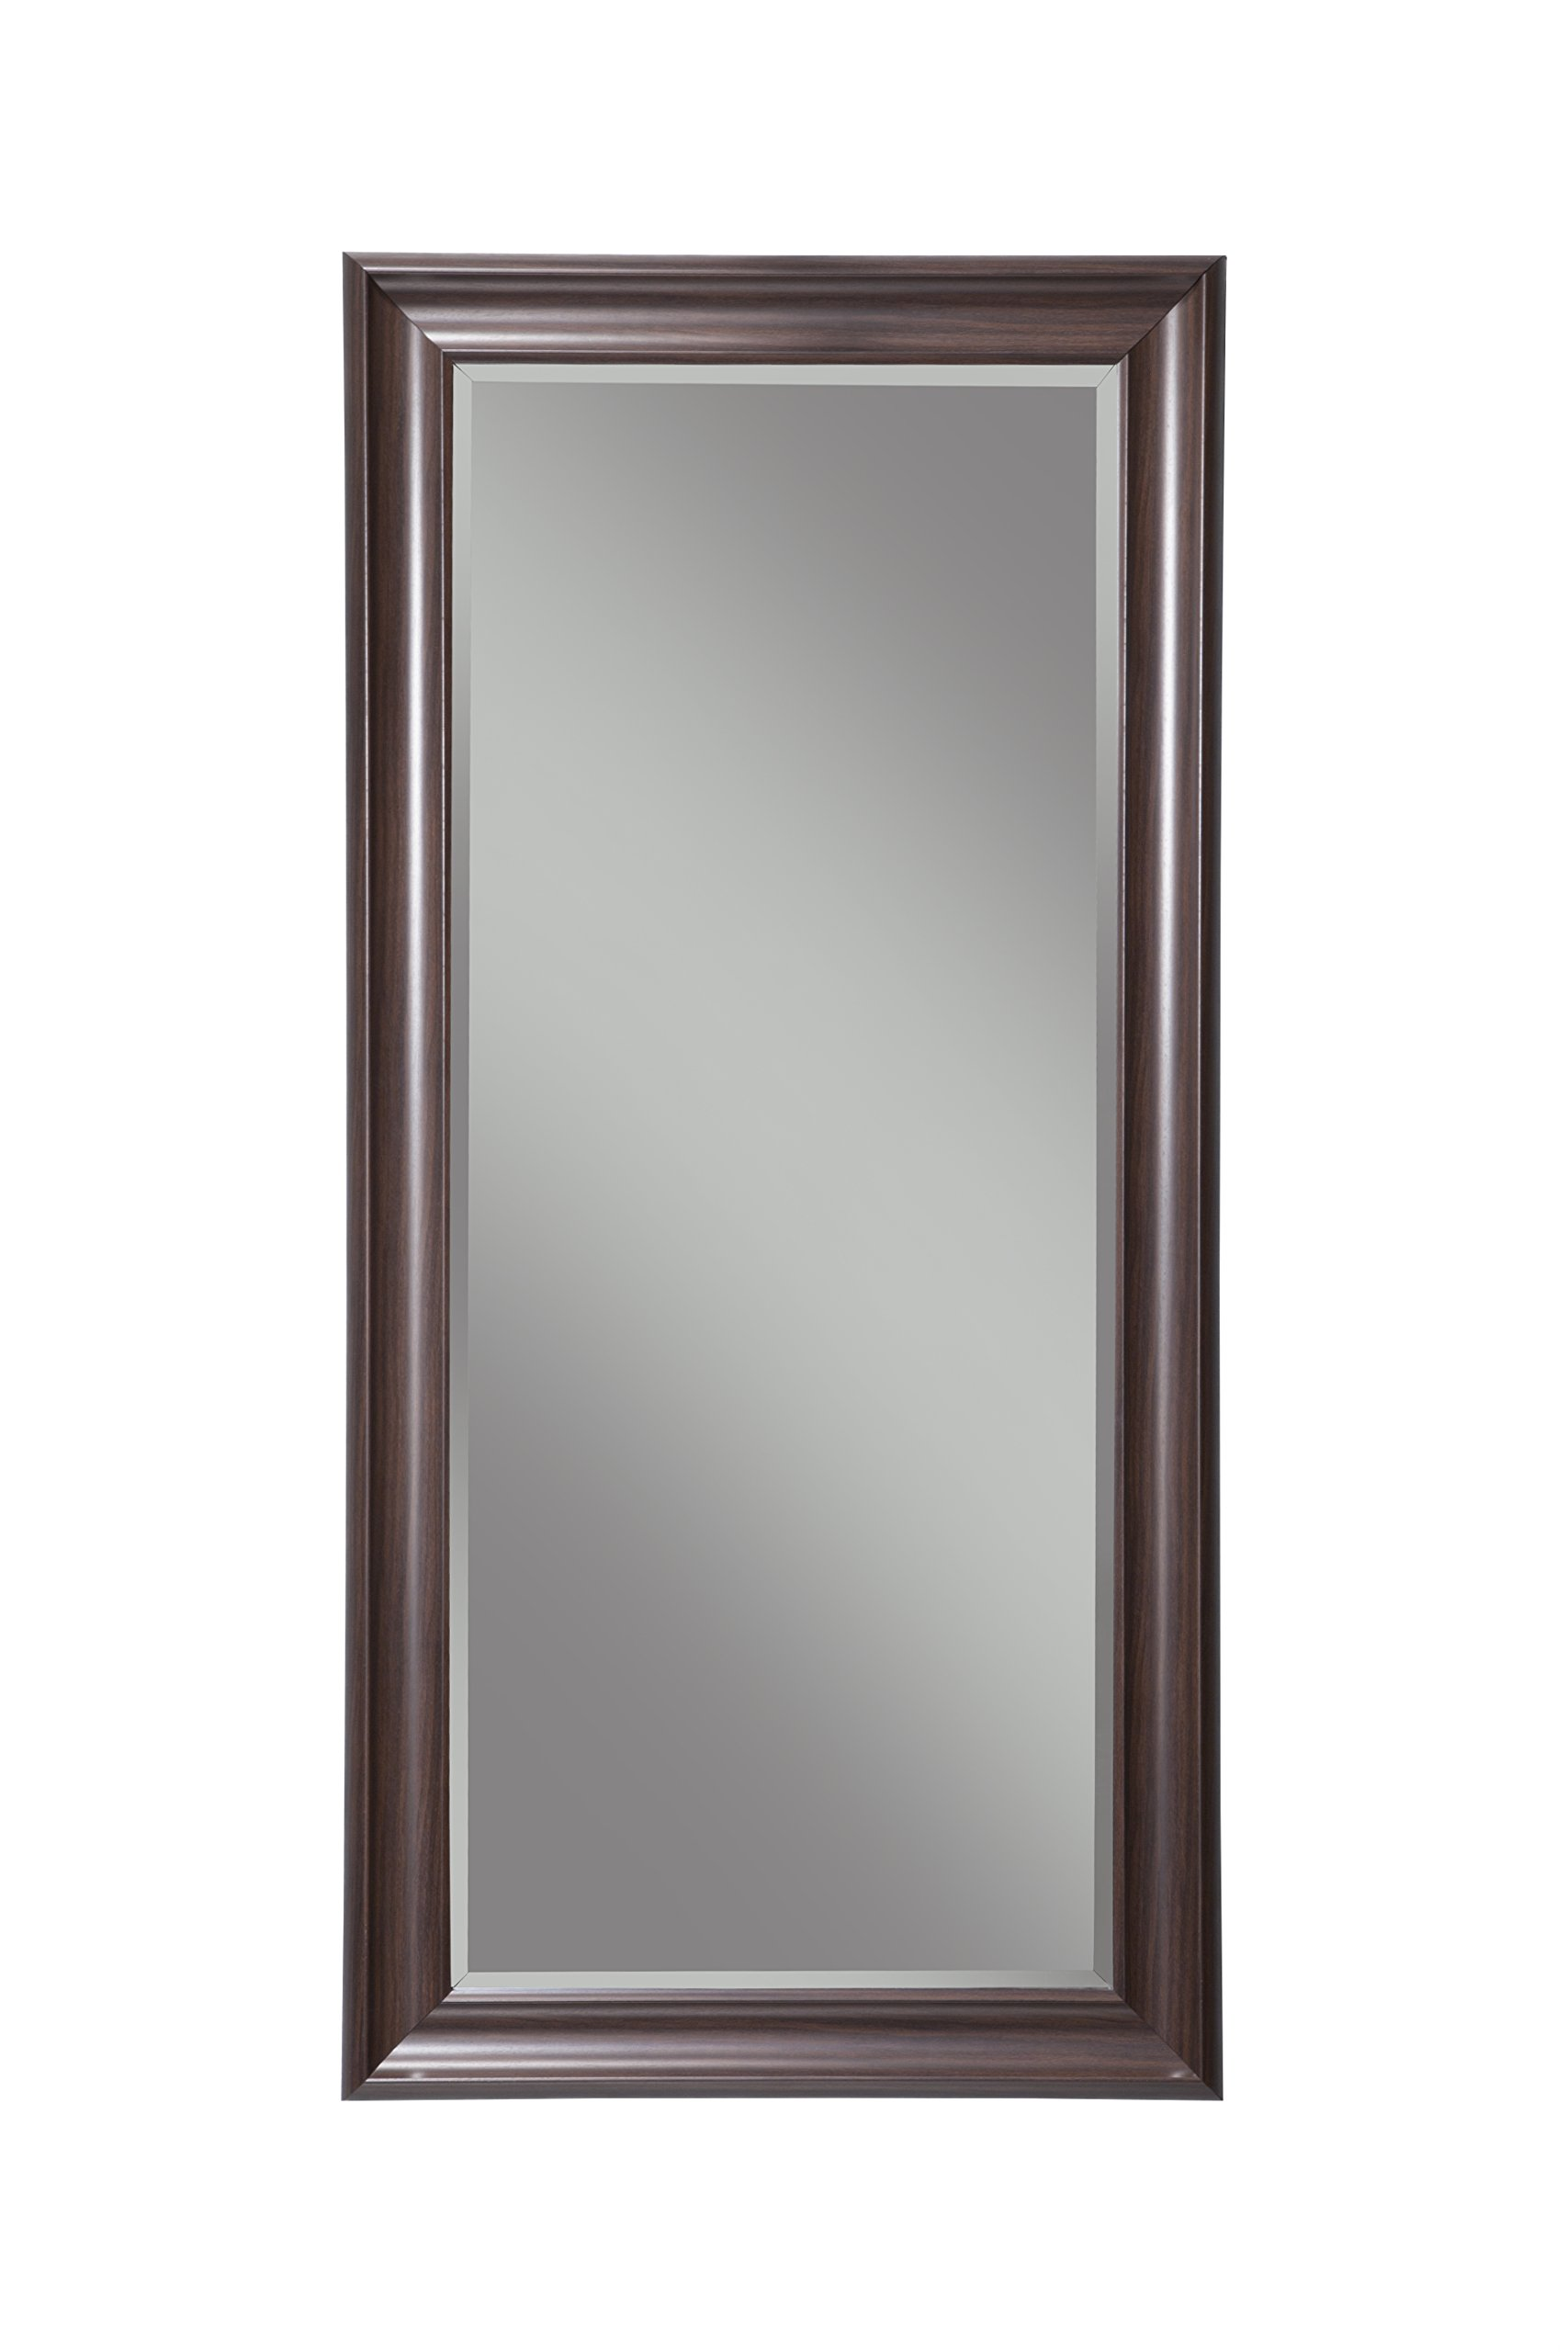 Sandberg Furniture, Full Length Leaner Mirror, Espresso